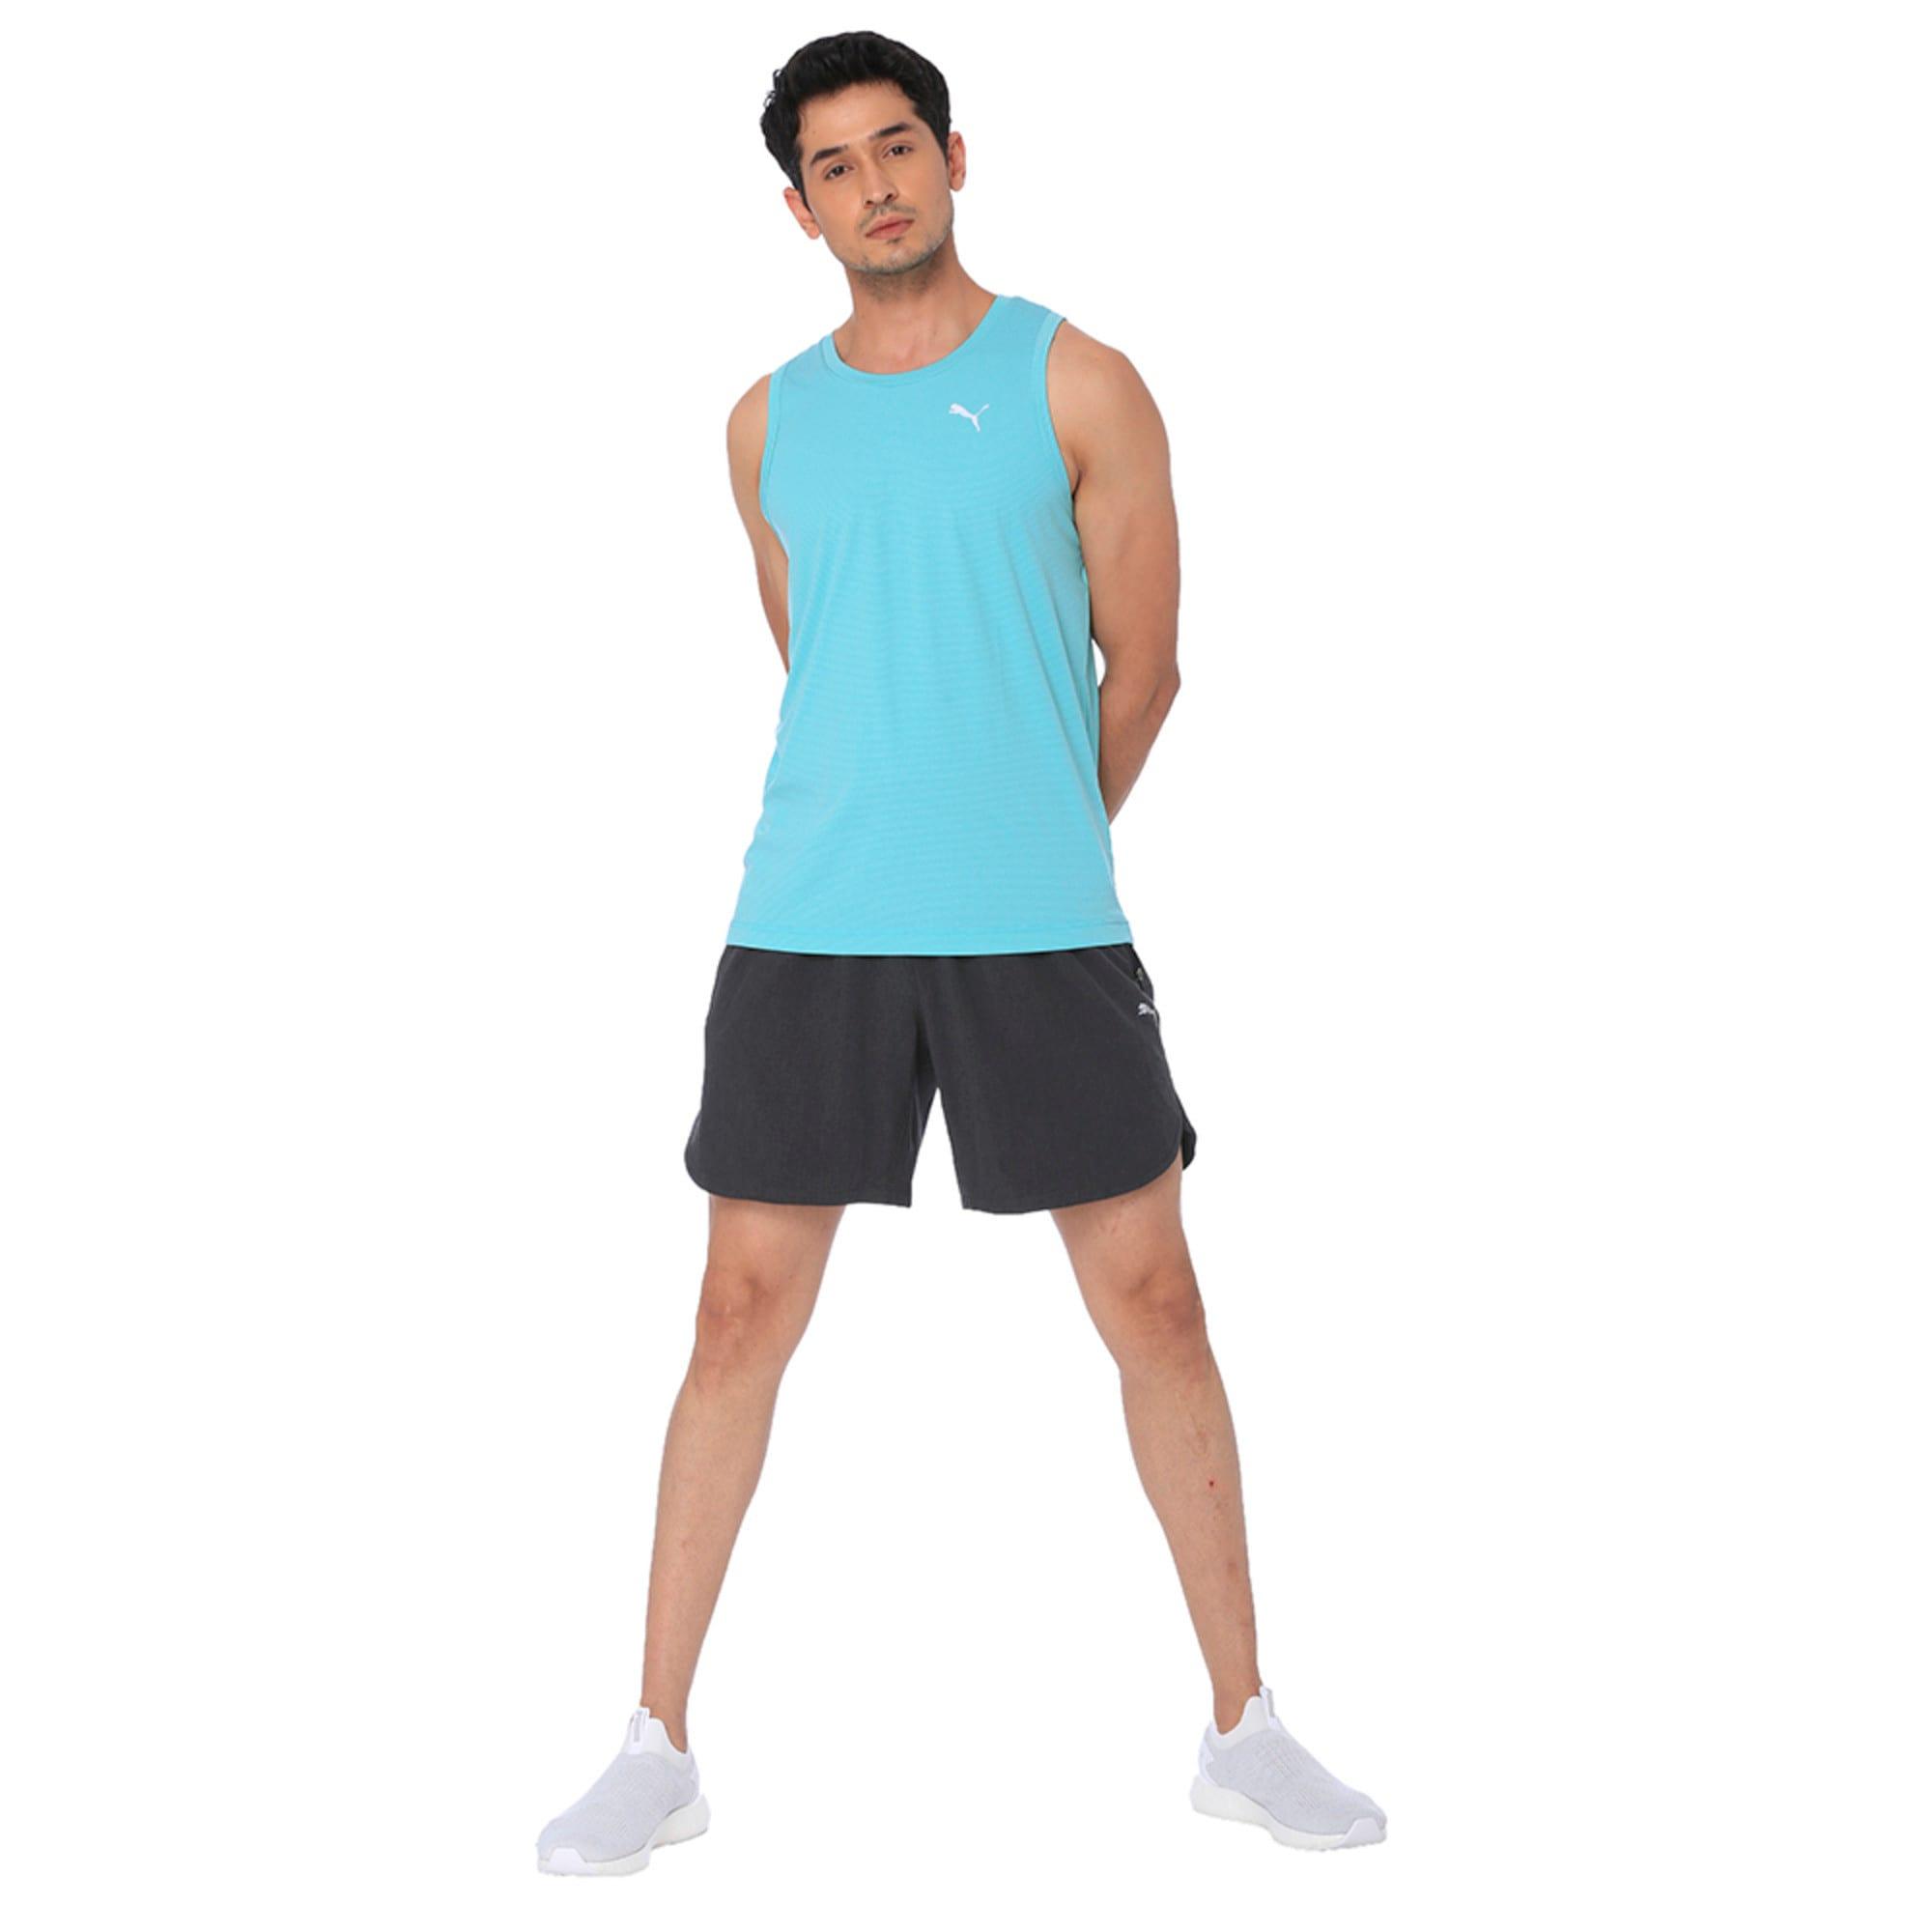 Thumbnail 1 of one8 VK Men's Active Shorts, Dark Gray Heather, medium-IND